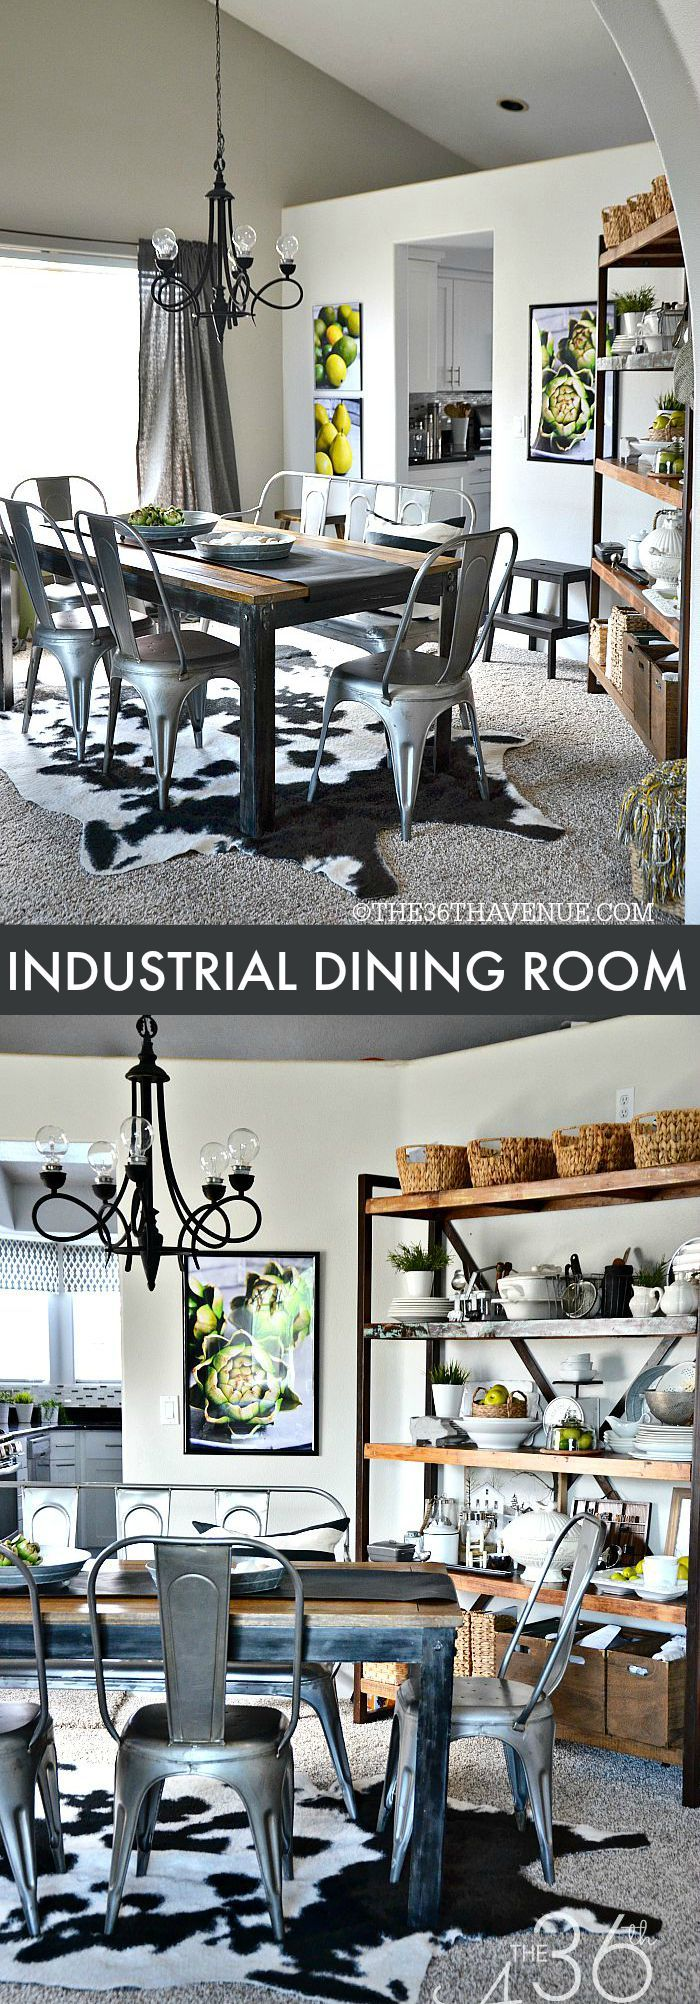 best 25 industrial dining ideas on pinterest loft cafe black